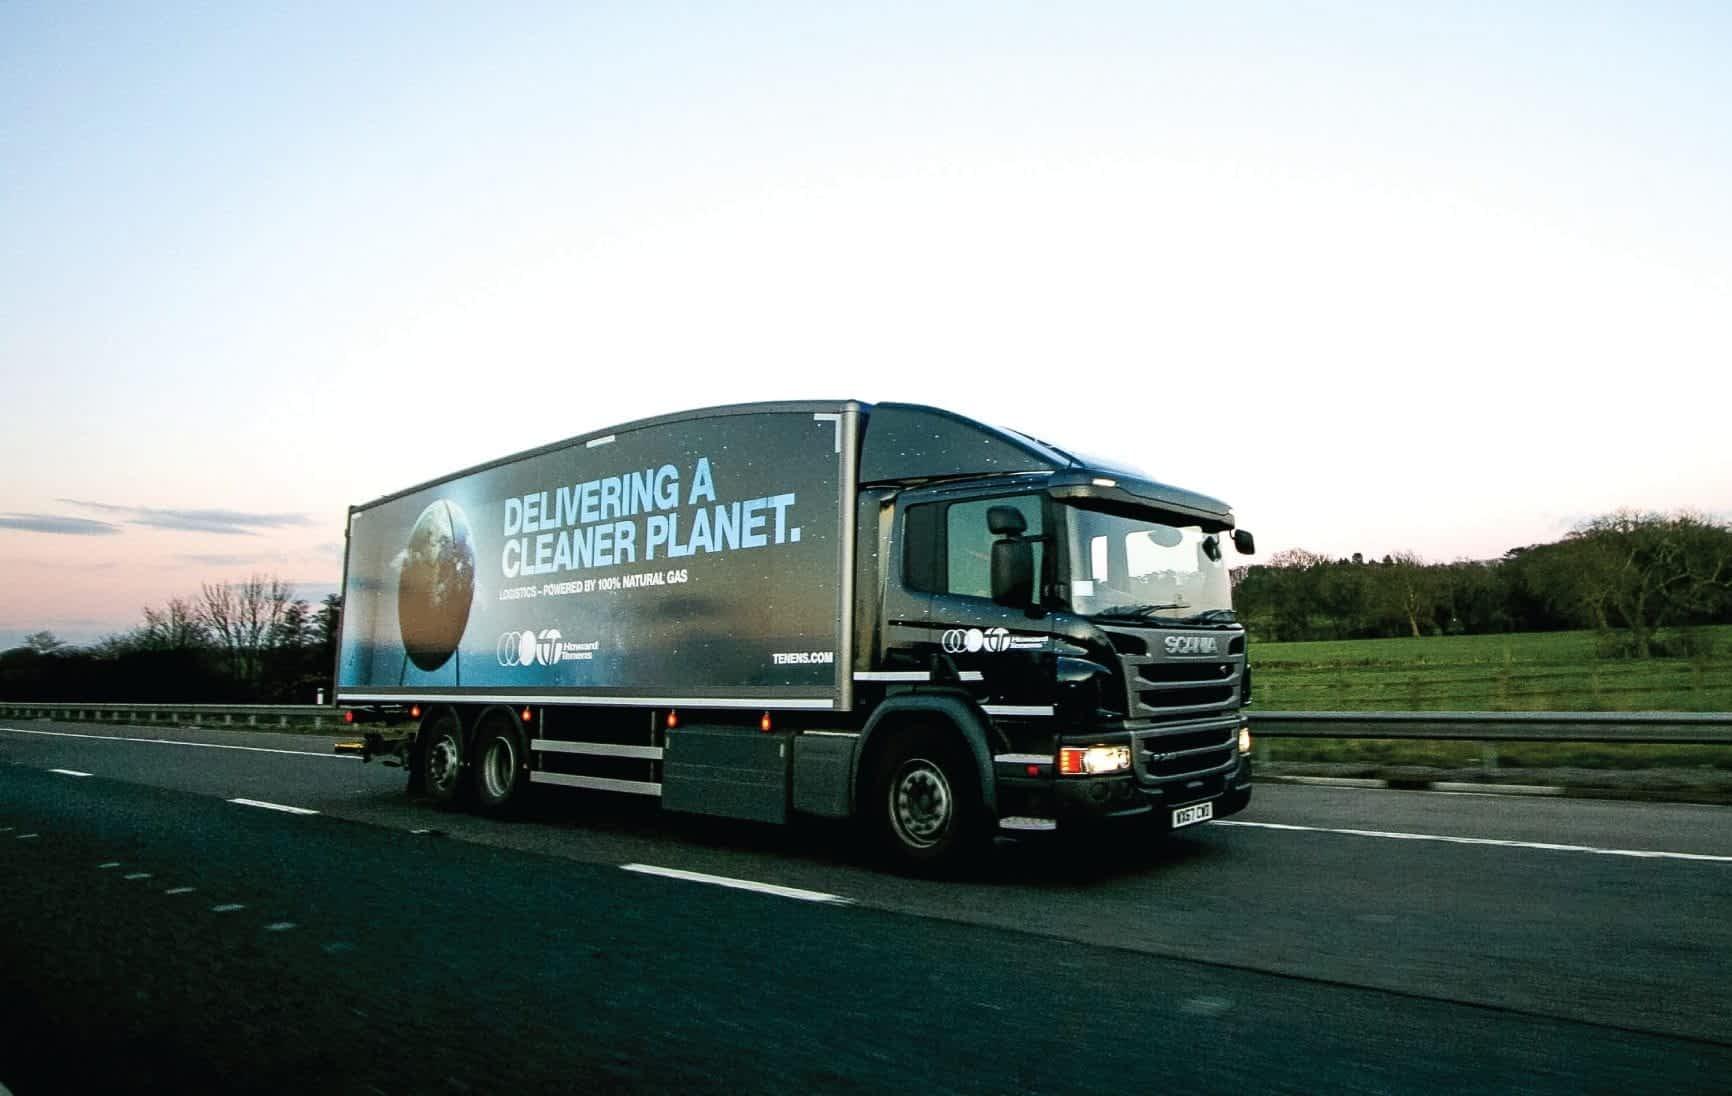 Howard Tenens Award Winning cleaner planet livery